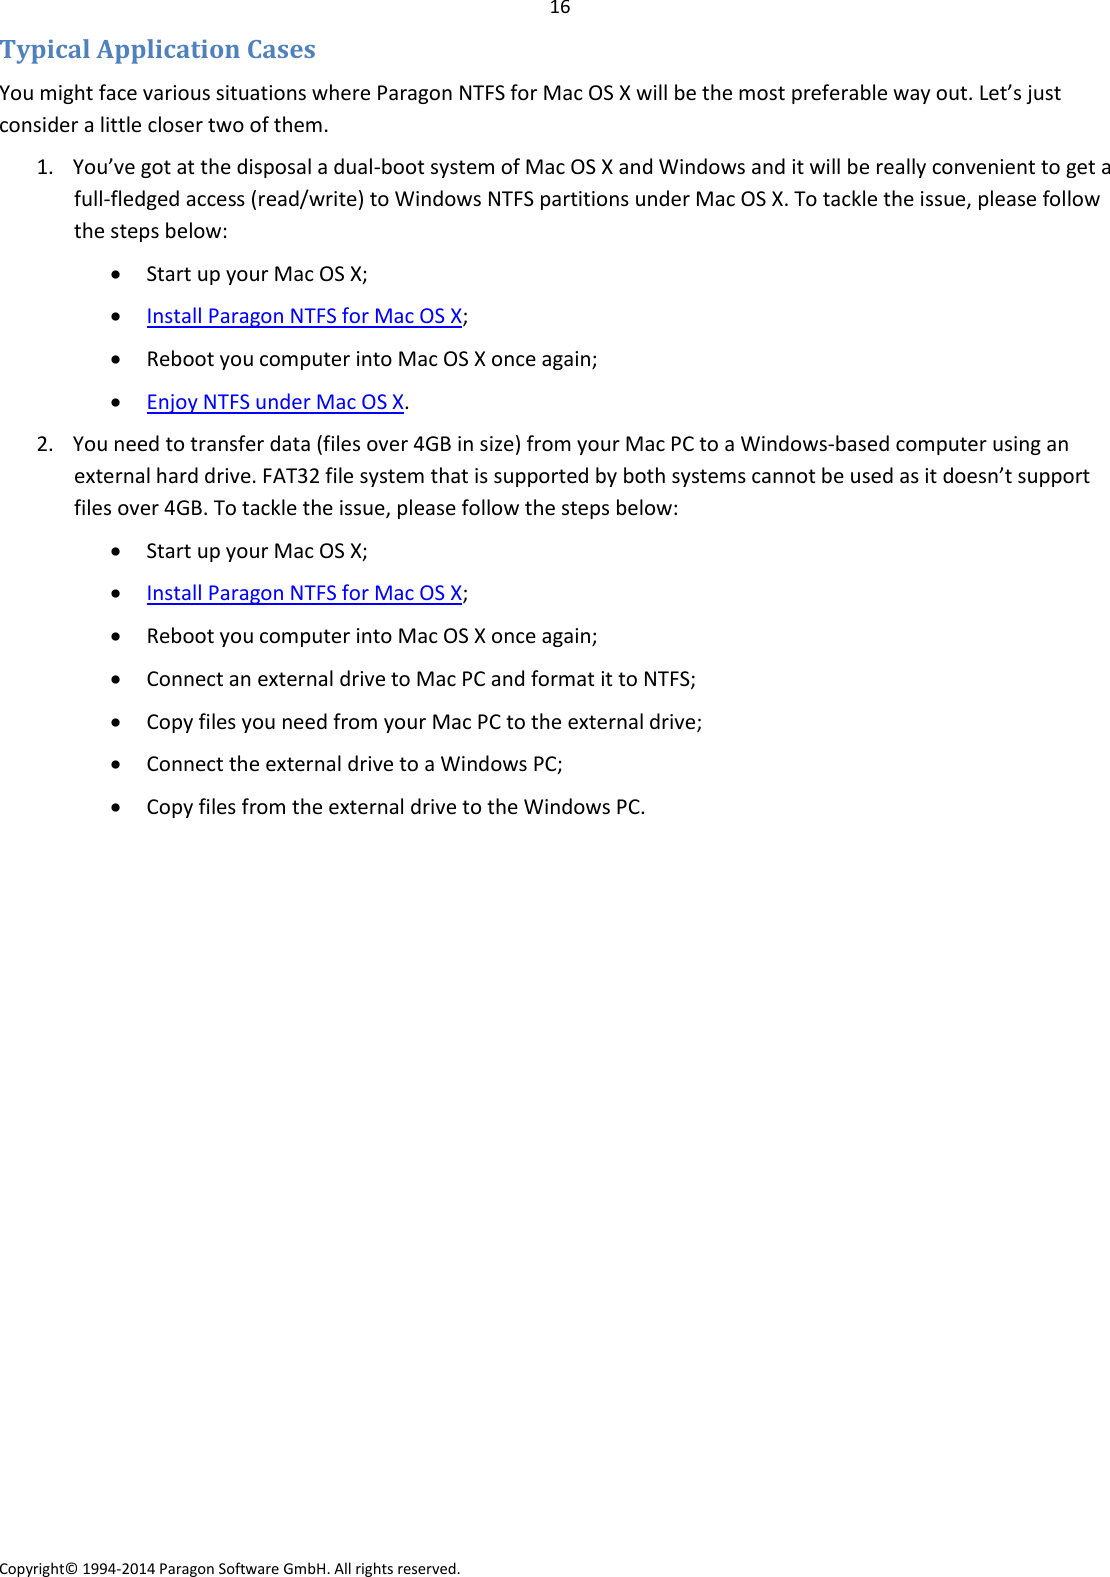 Paragon NTFS For Mac OS X 12 Operating Instructions En